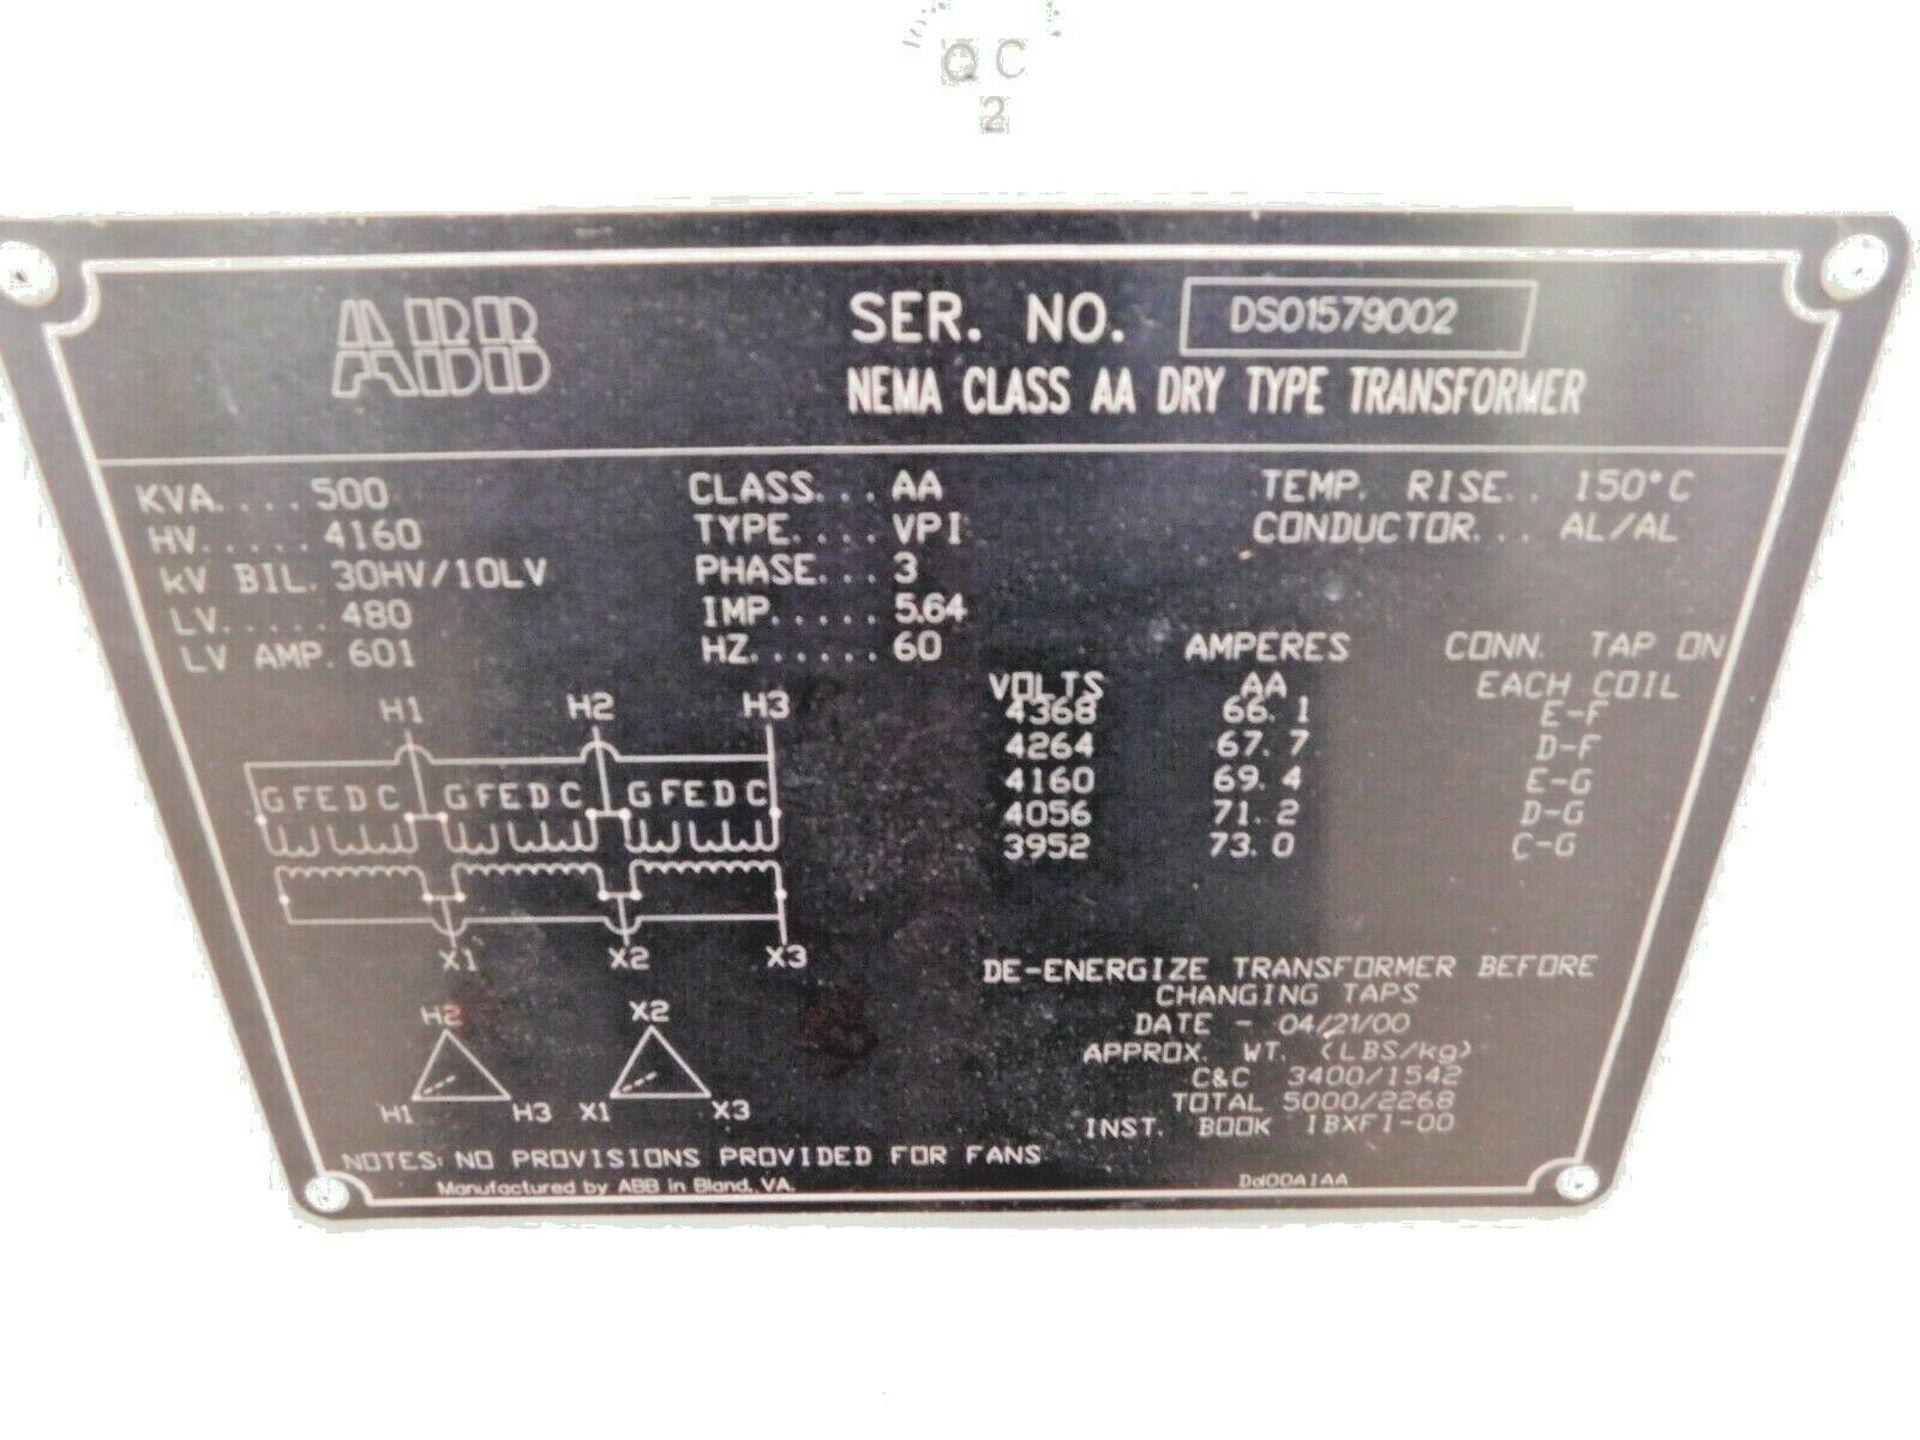 ABB 500 KVA Dry Type Transformer. 3 Ph. 4160 HV. 480 LV. 60 Hz. - Image 5 of 5